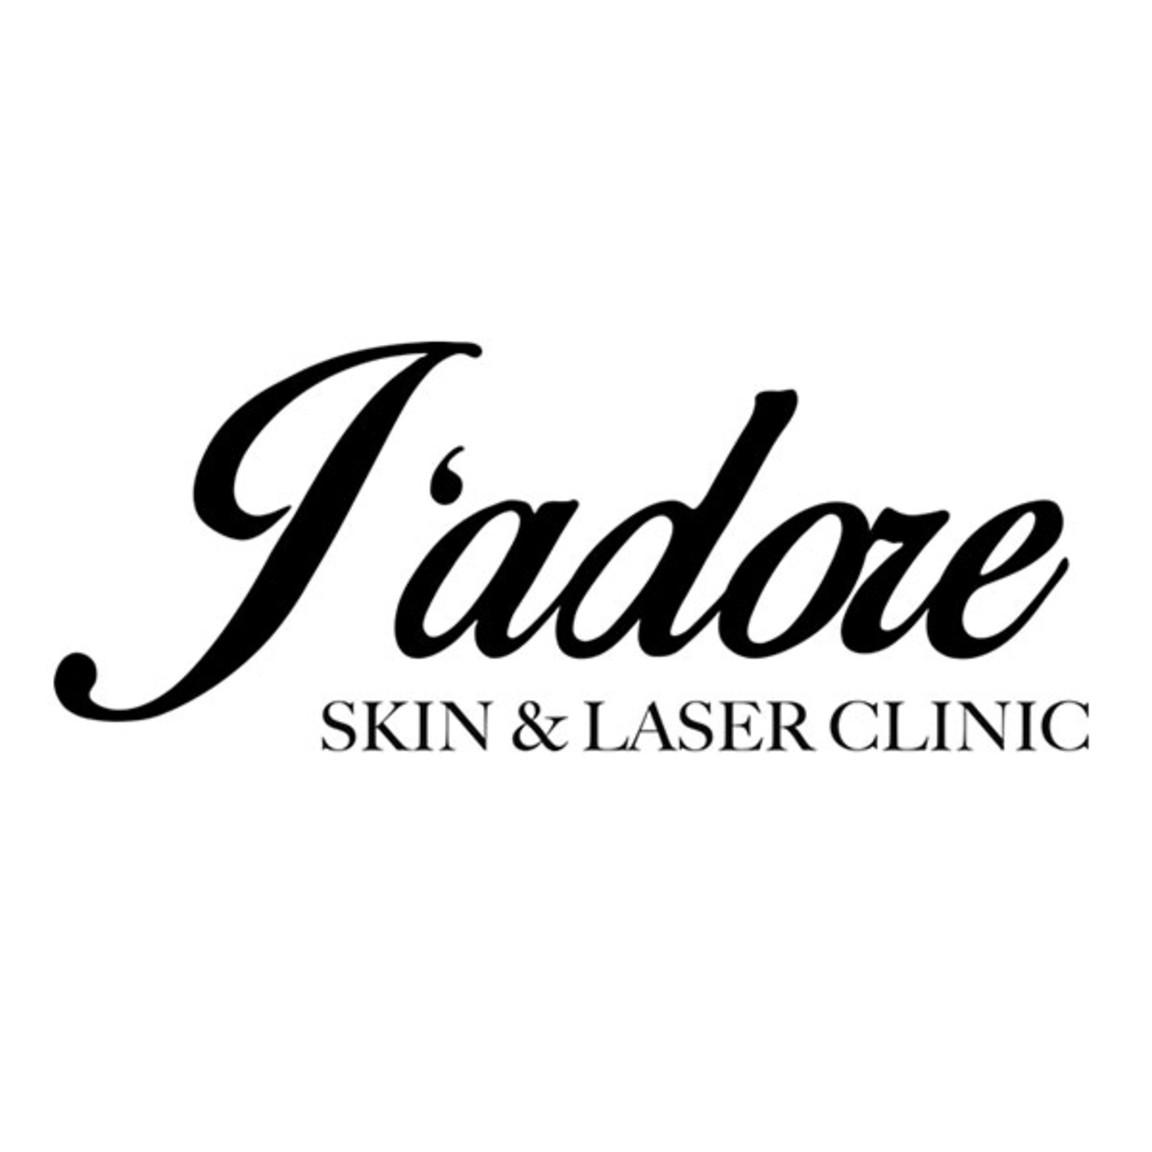 J'adore Skin & Laser Clinic at Westfield Mt Druitt